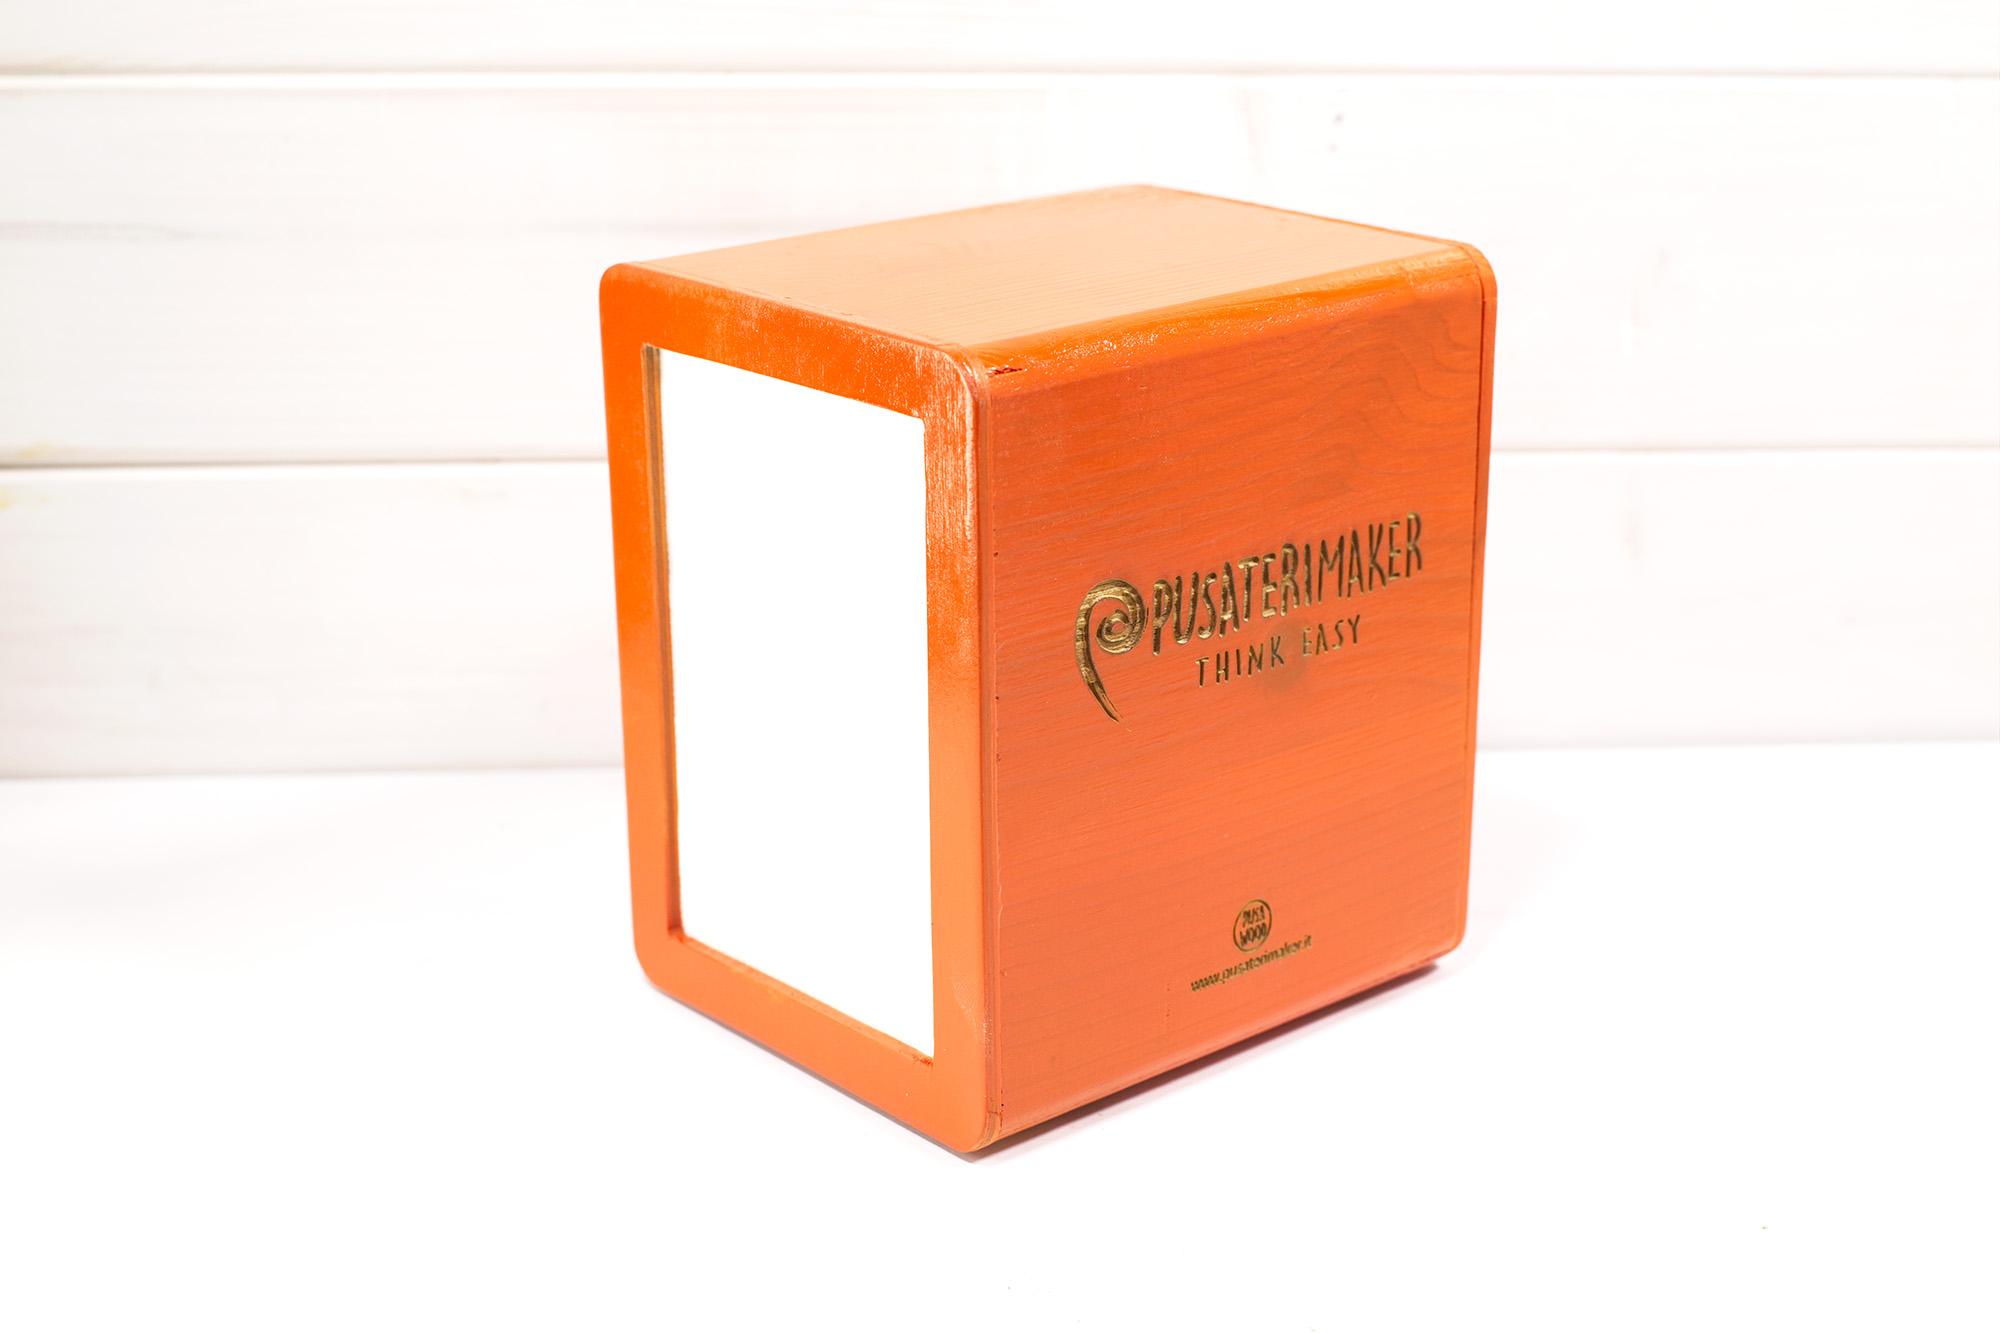 Portatovaglioli Da Bar Arancione Virrina Sfirriato